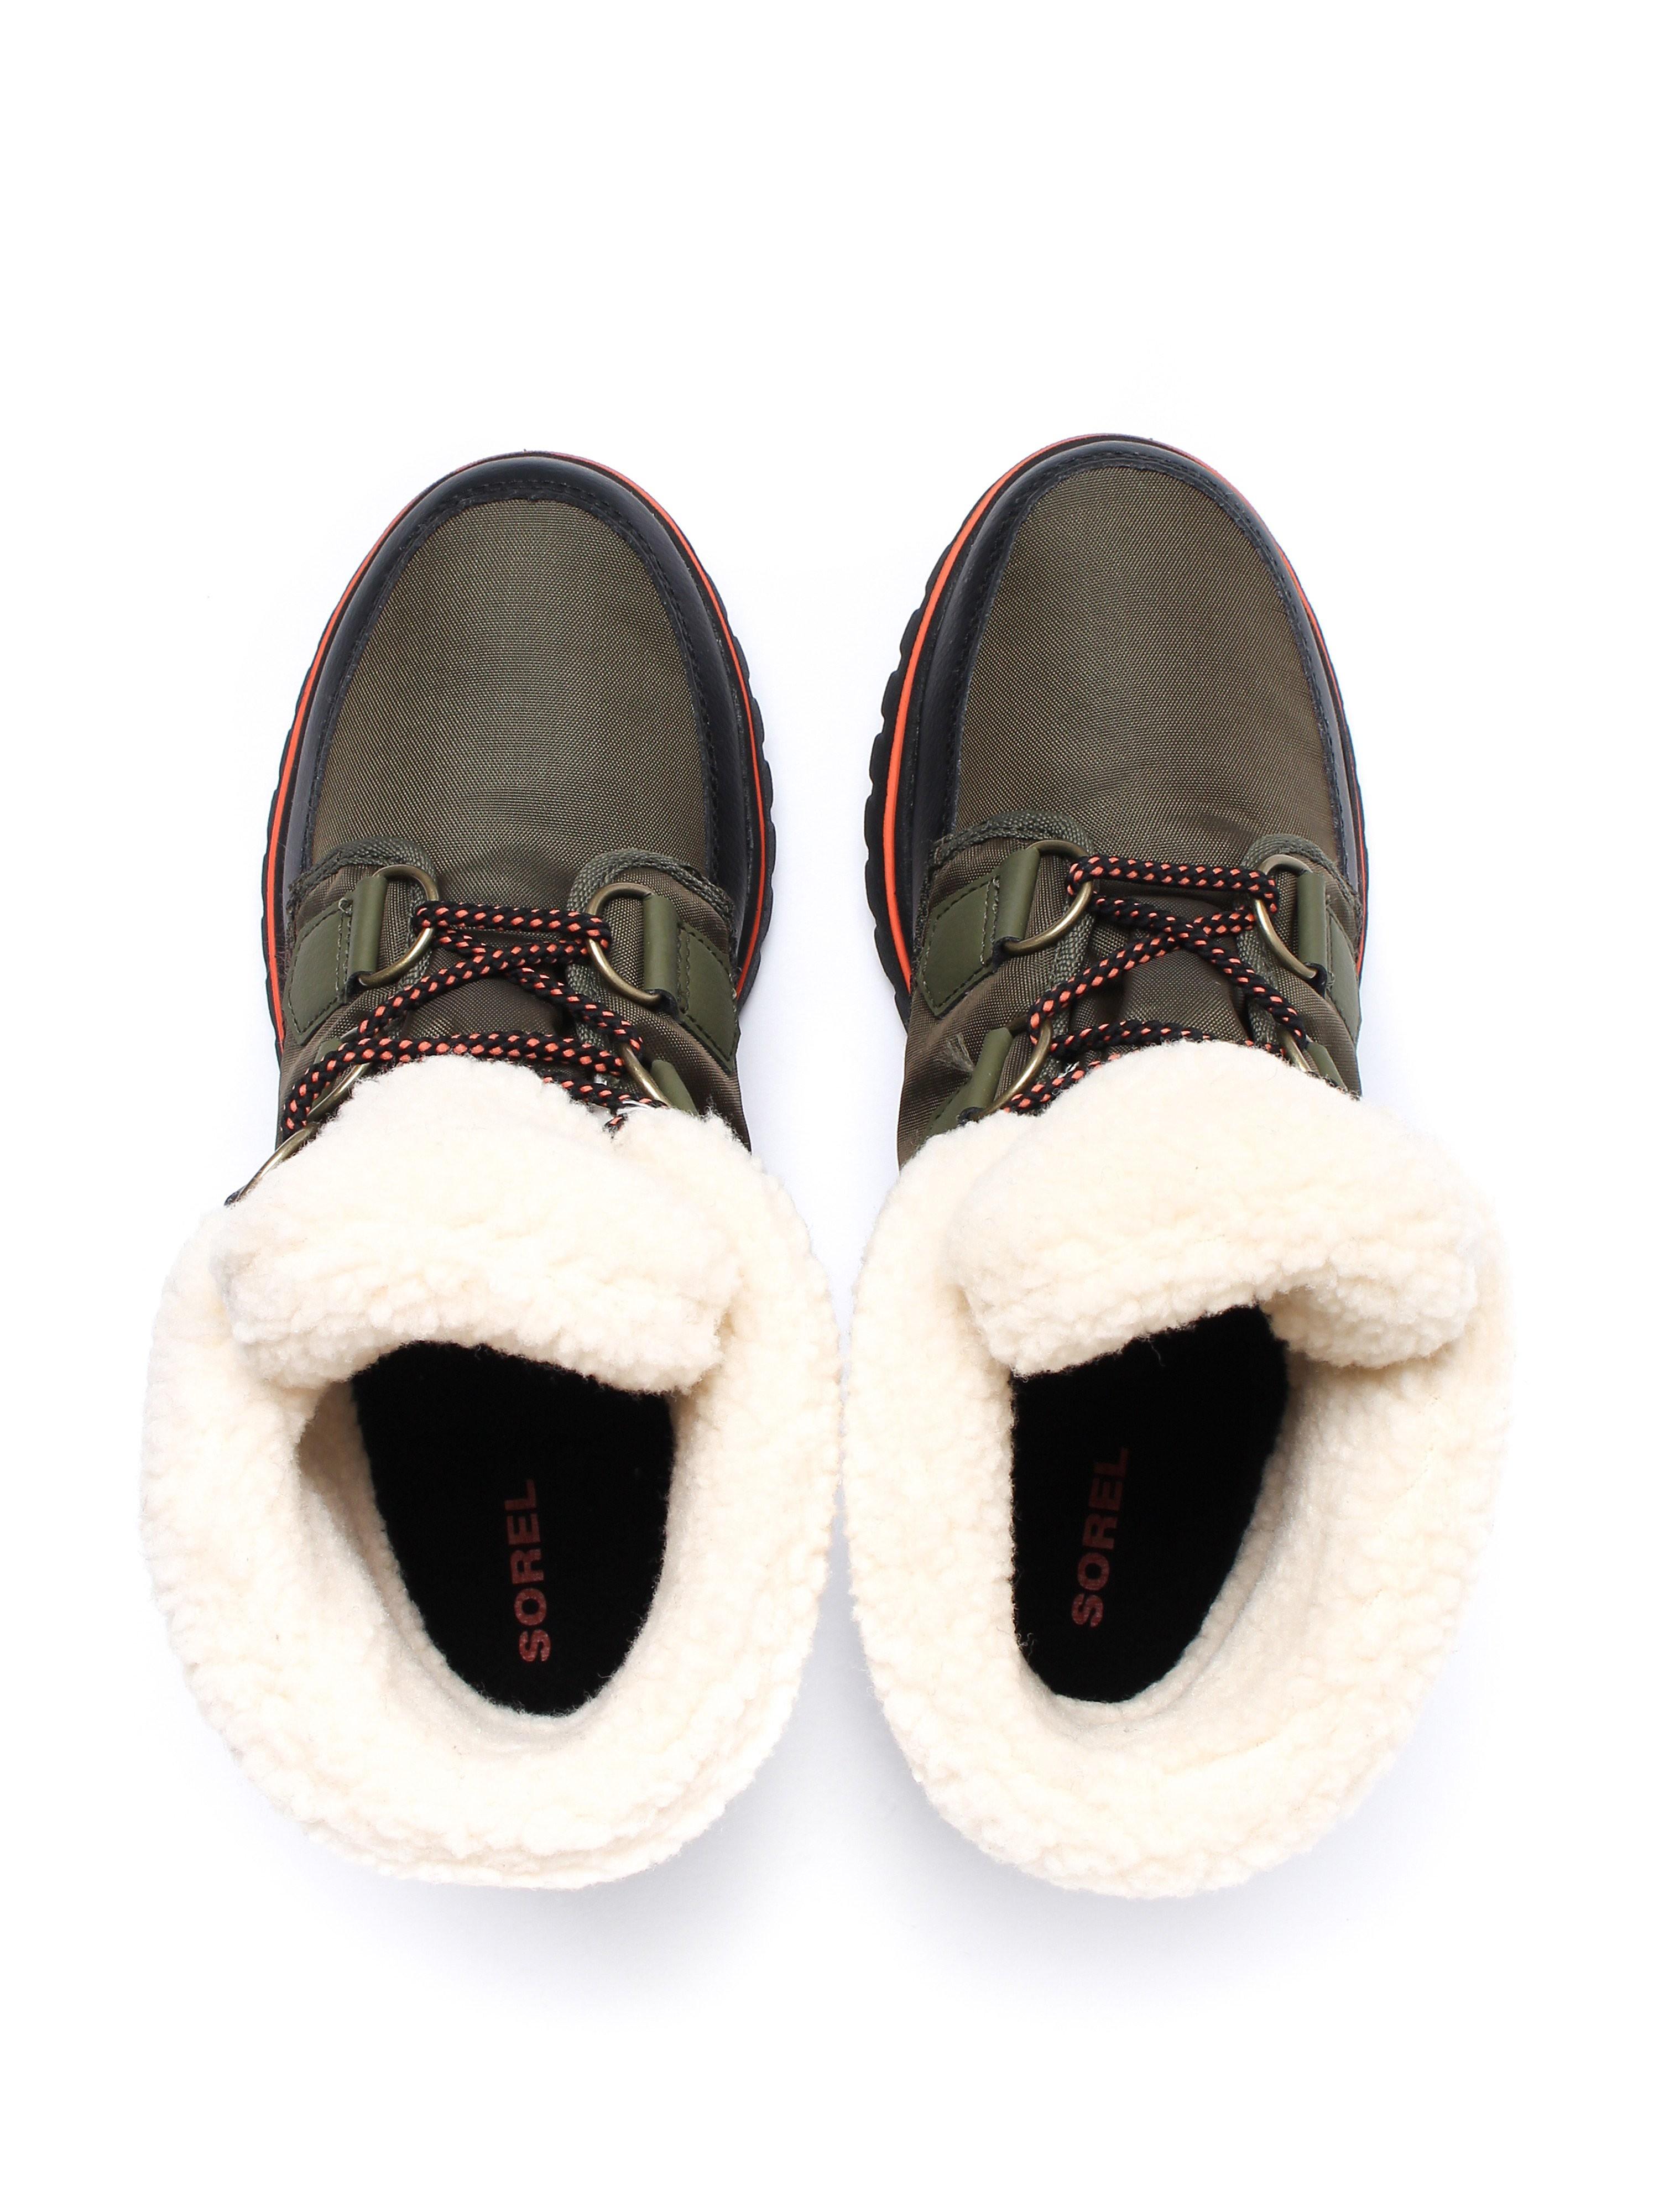 Sorel Women's Cozy Carnival Boots - Nori